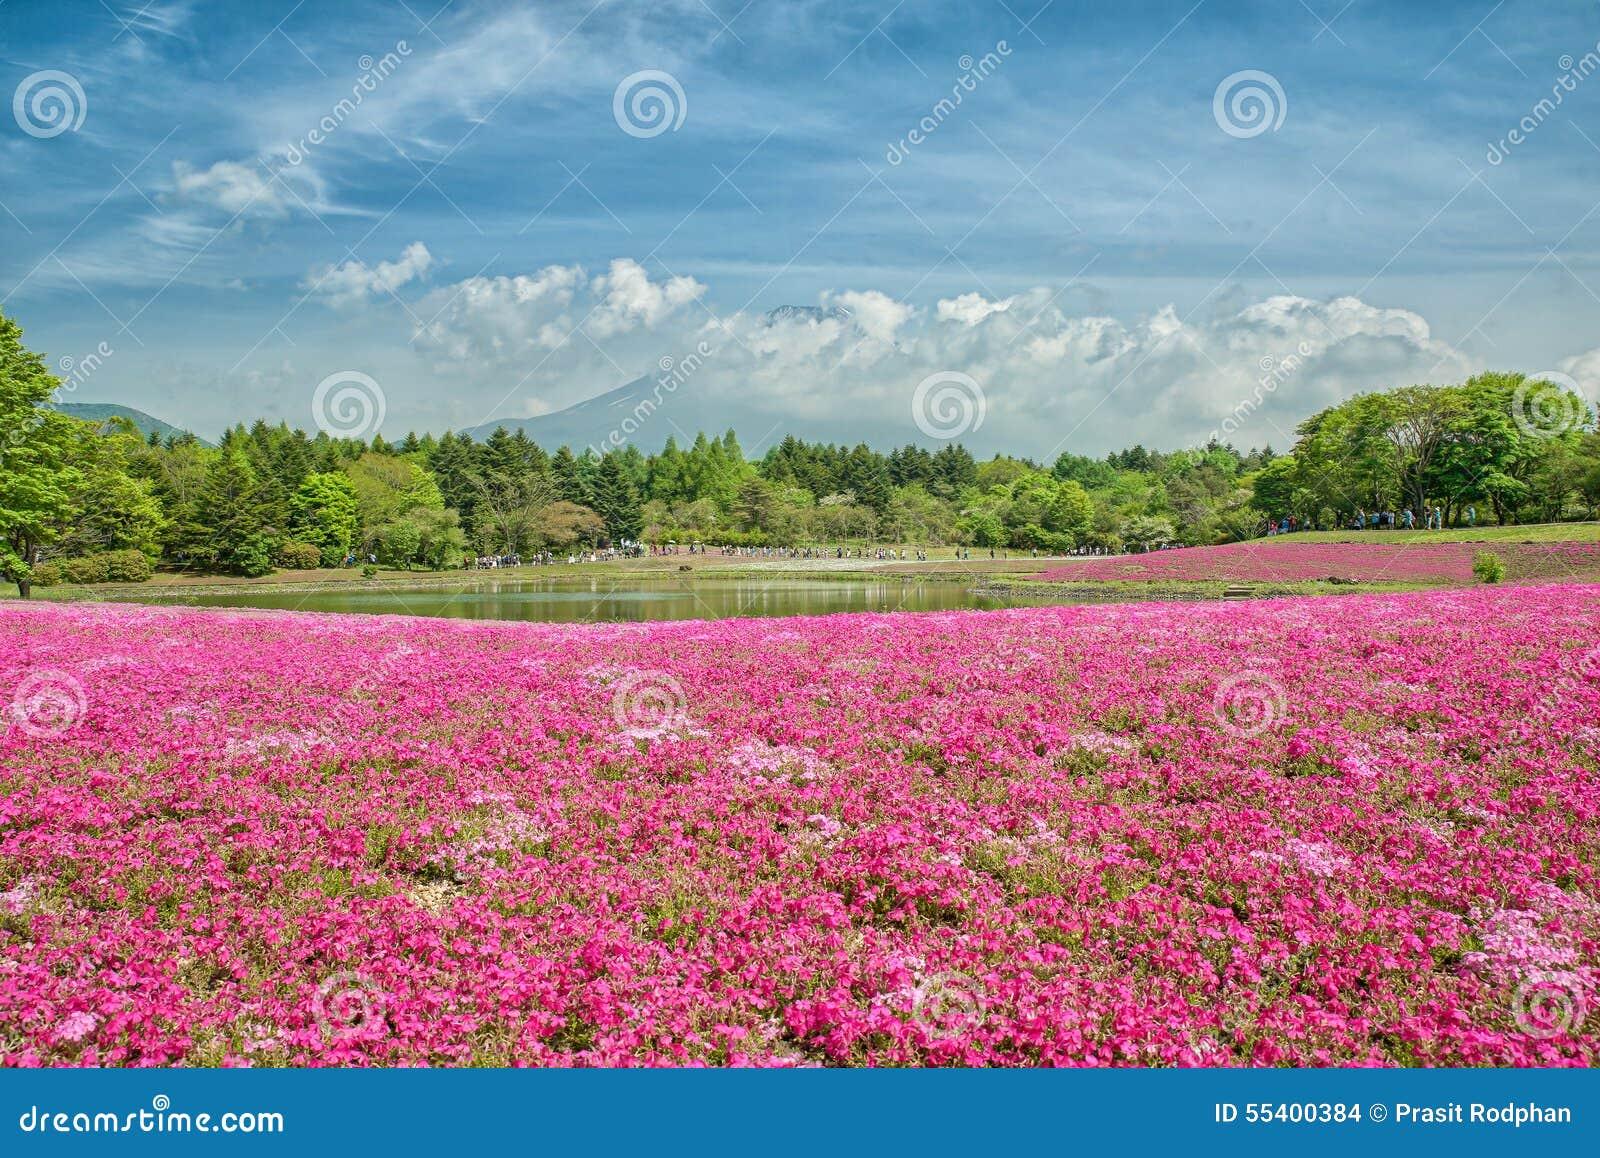 Fuji with the field of pink moss at Shibazakura festival, Japan